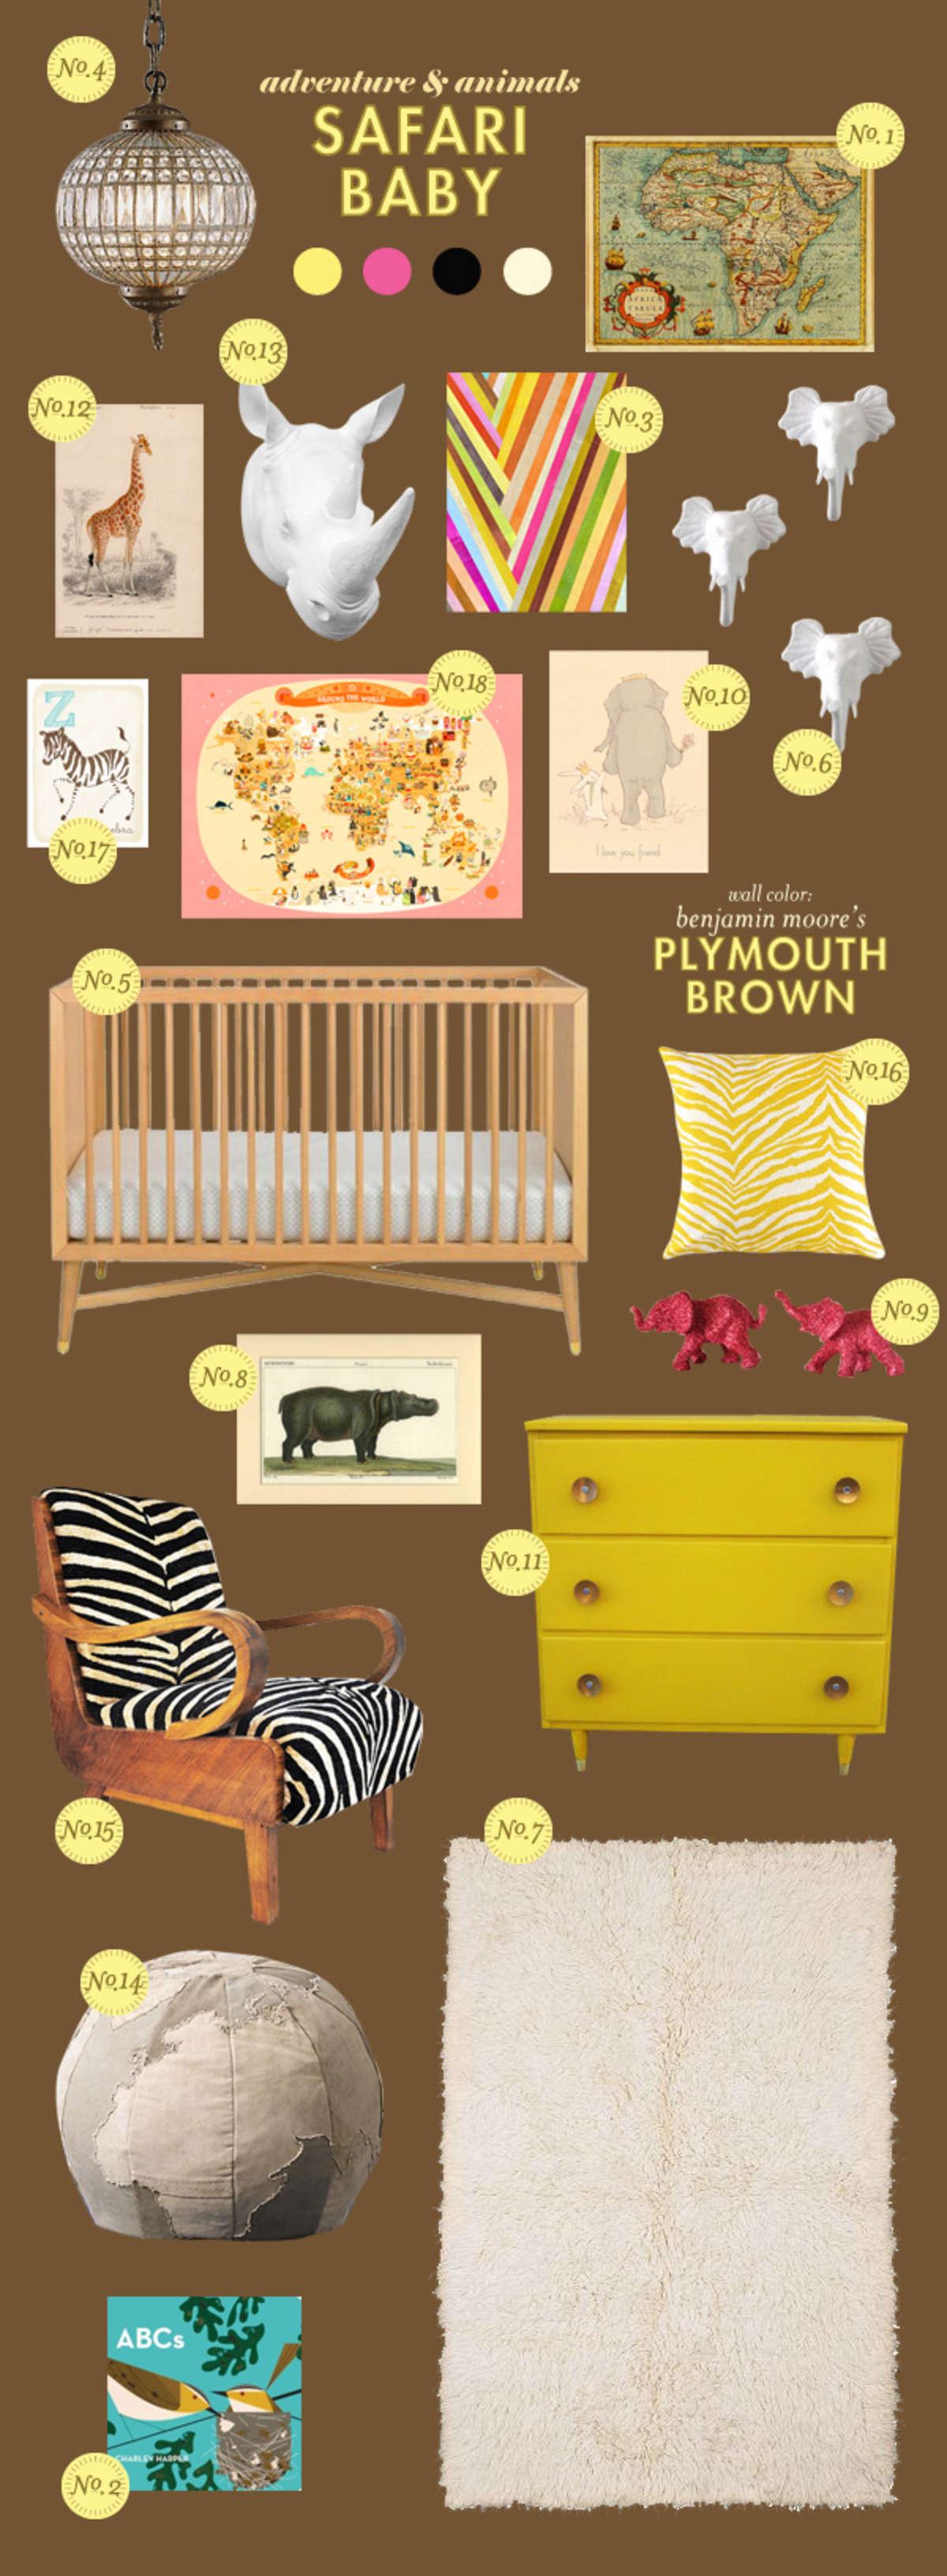 safari africa animals baby room ideas